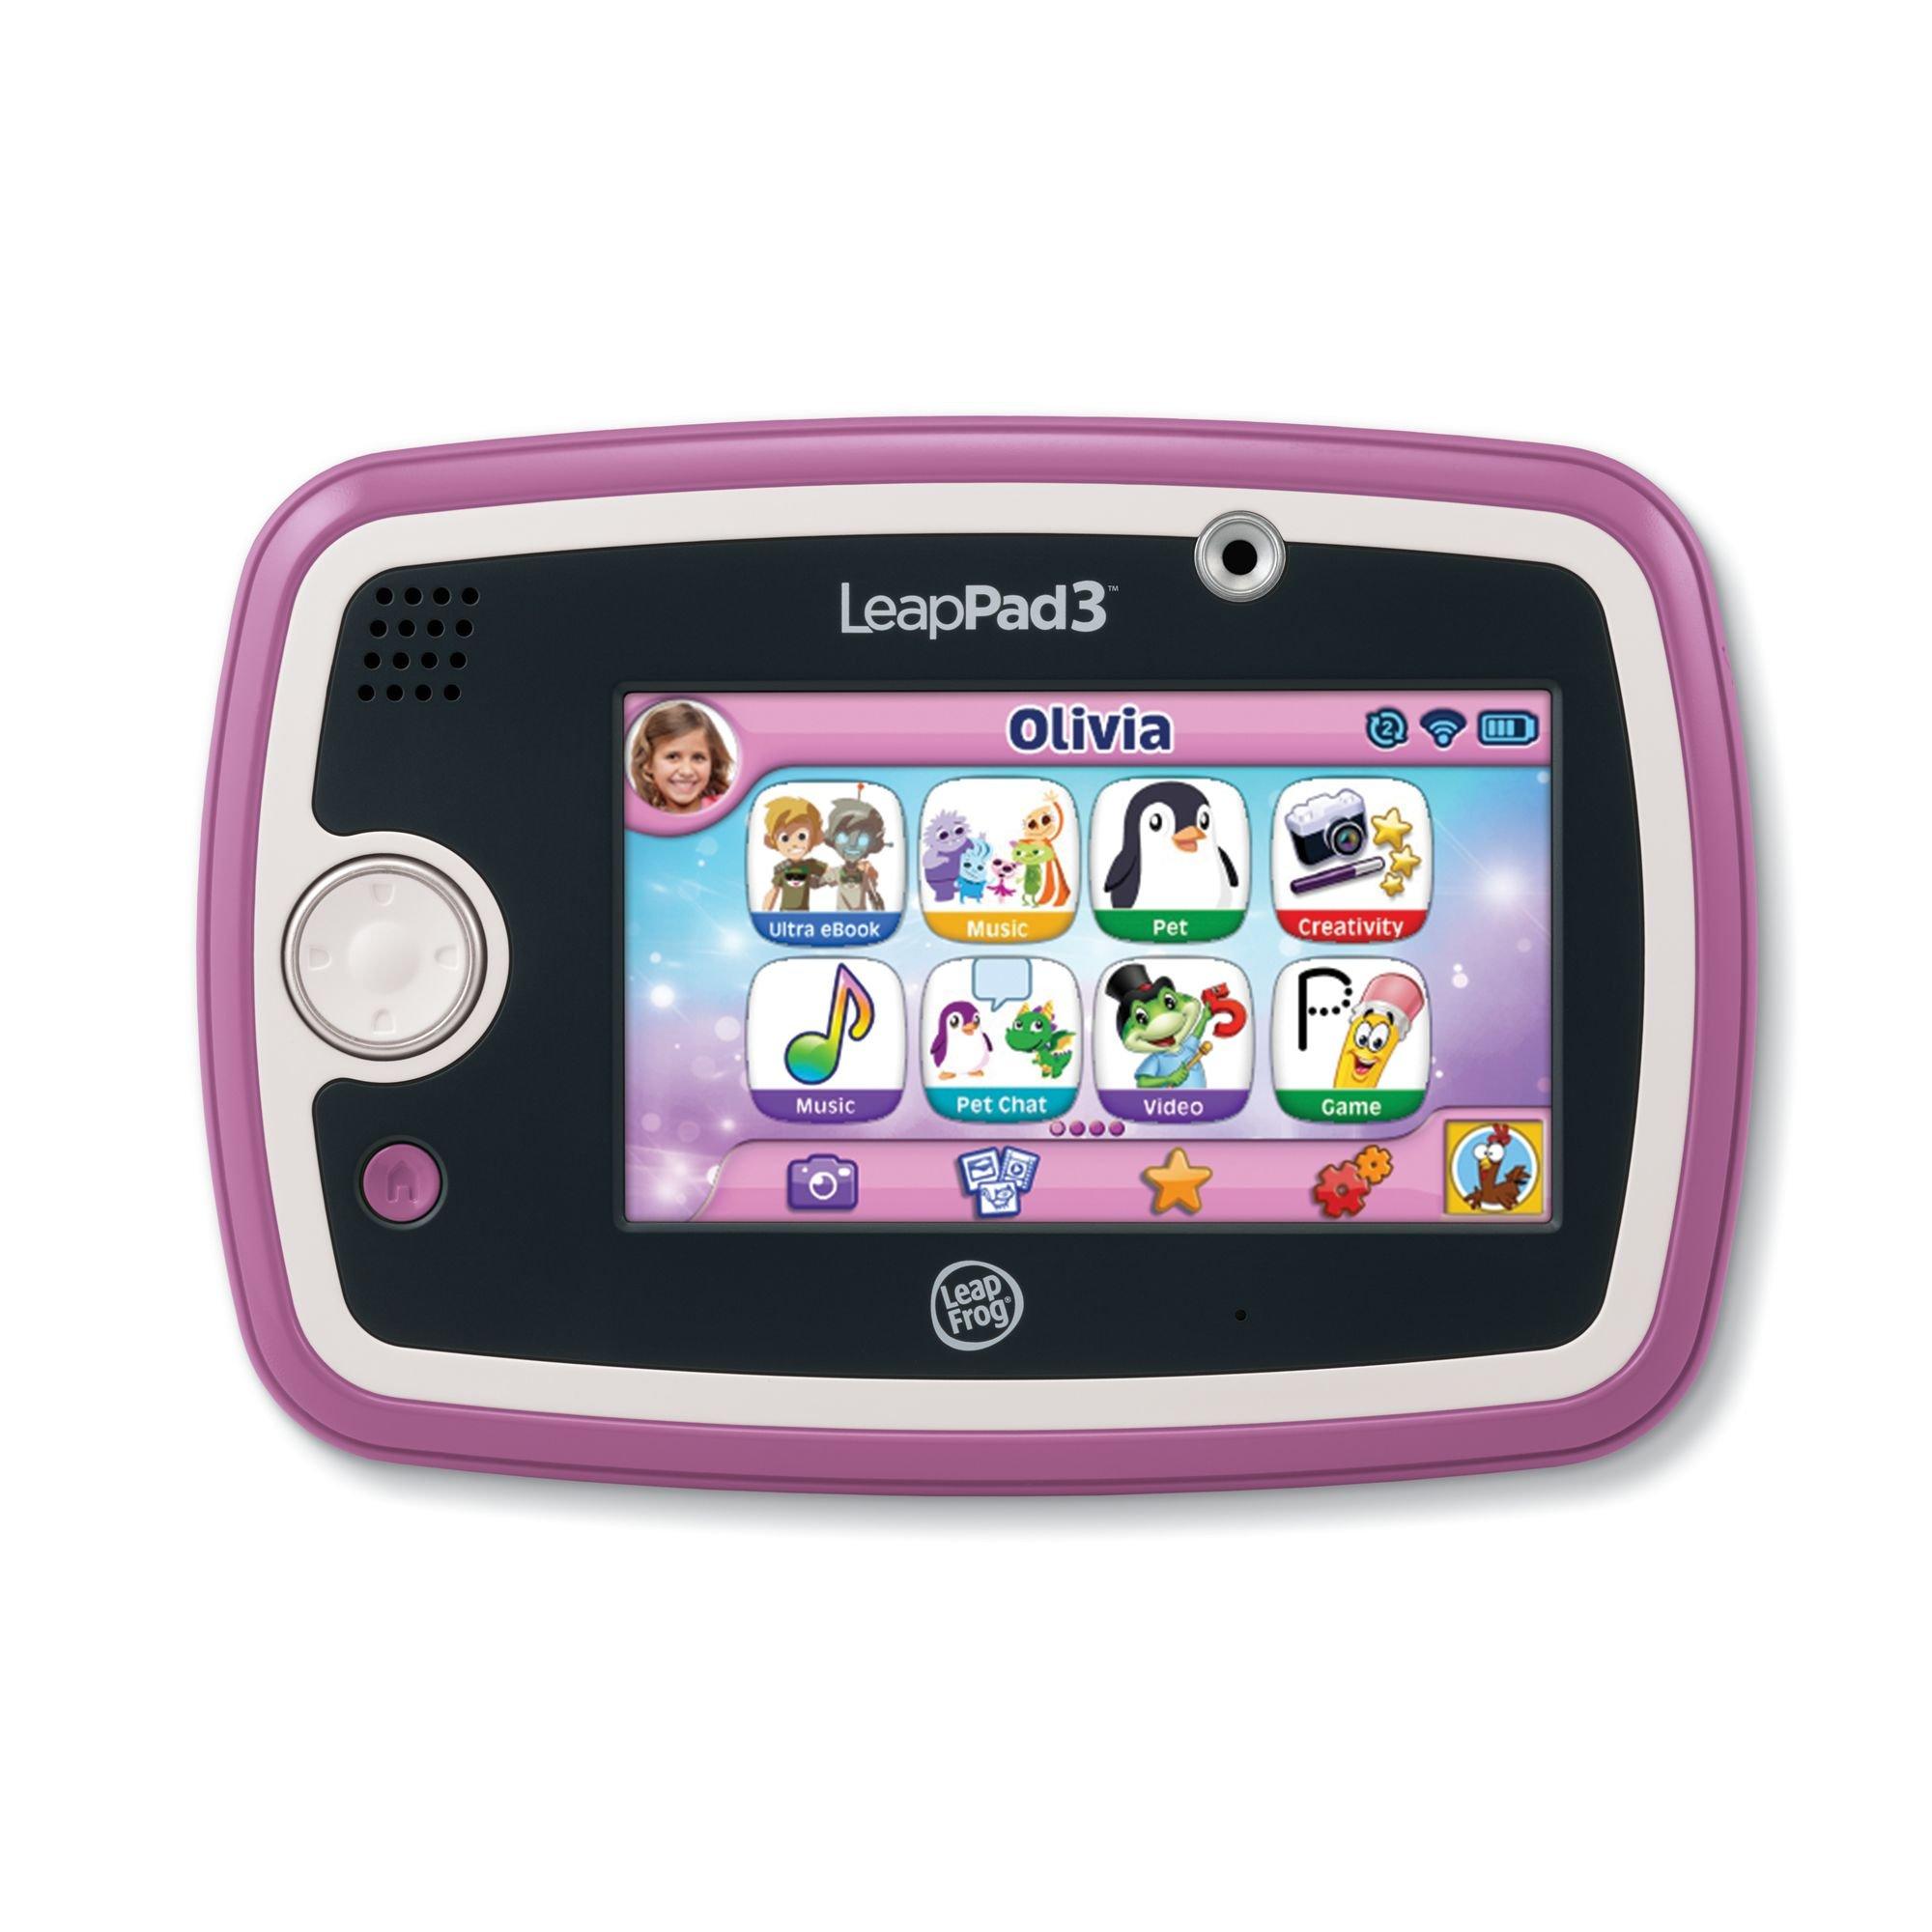 LeapFrog LeapPad3 Kids' Learning Tablet, Pink by LeapFrog